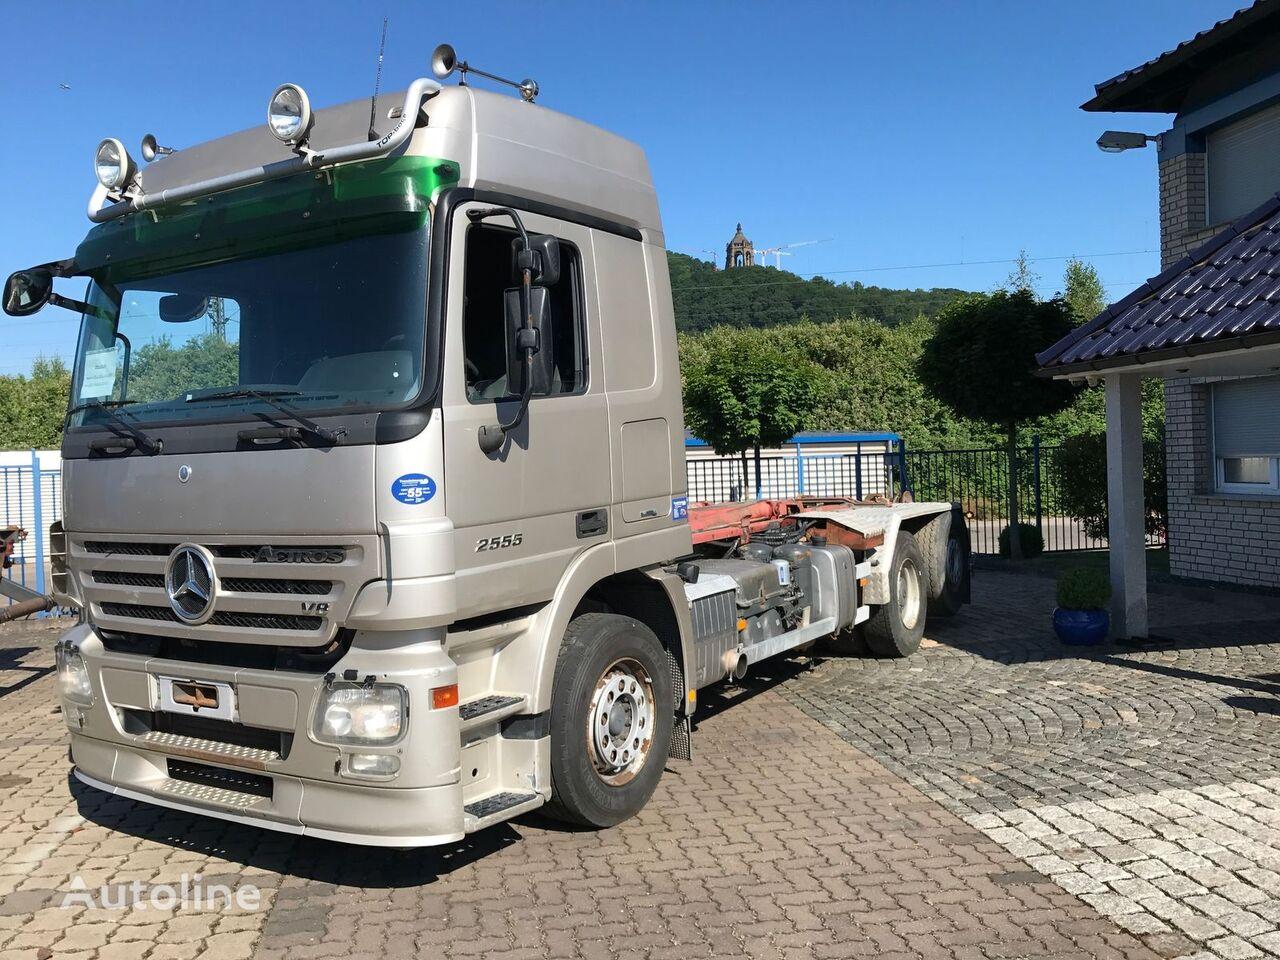 MERCEDES-BENZ 2555 L, 6X2,  Actros MP II, Mega, gelenkte Nachlauf-Liftachse kamion rol kiper